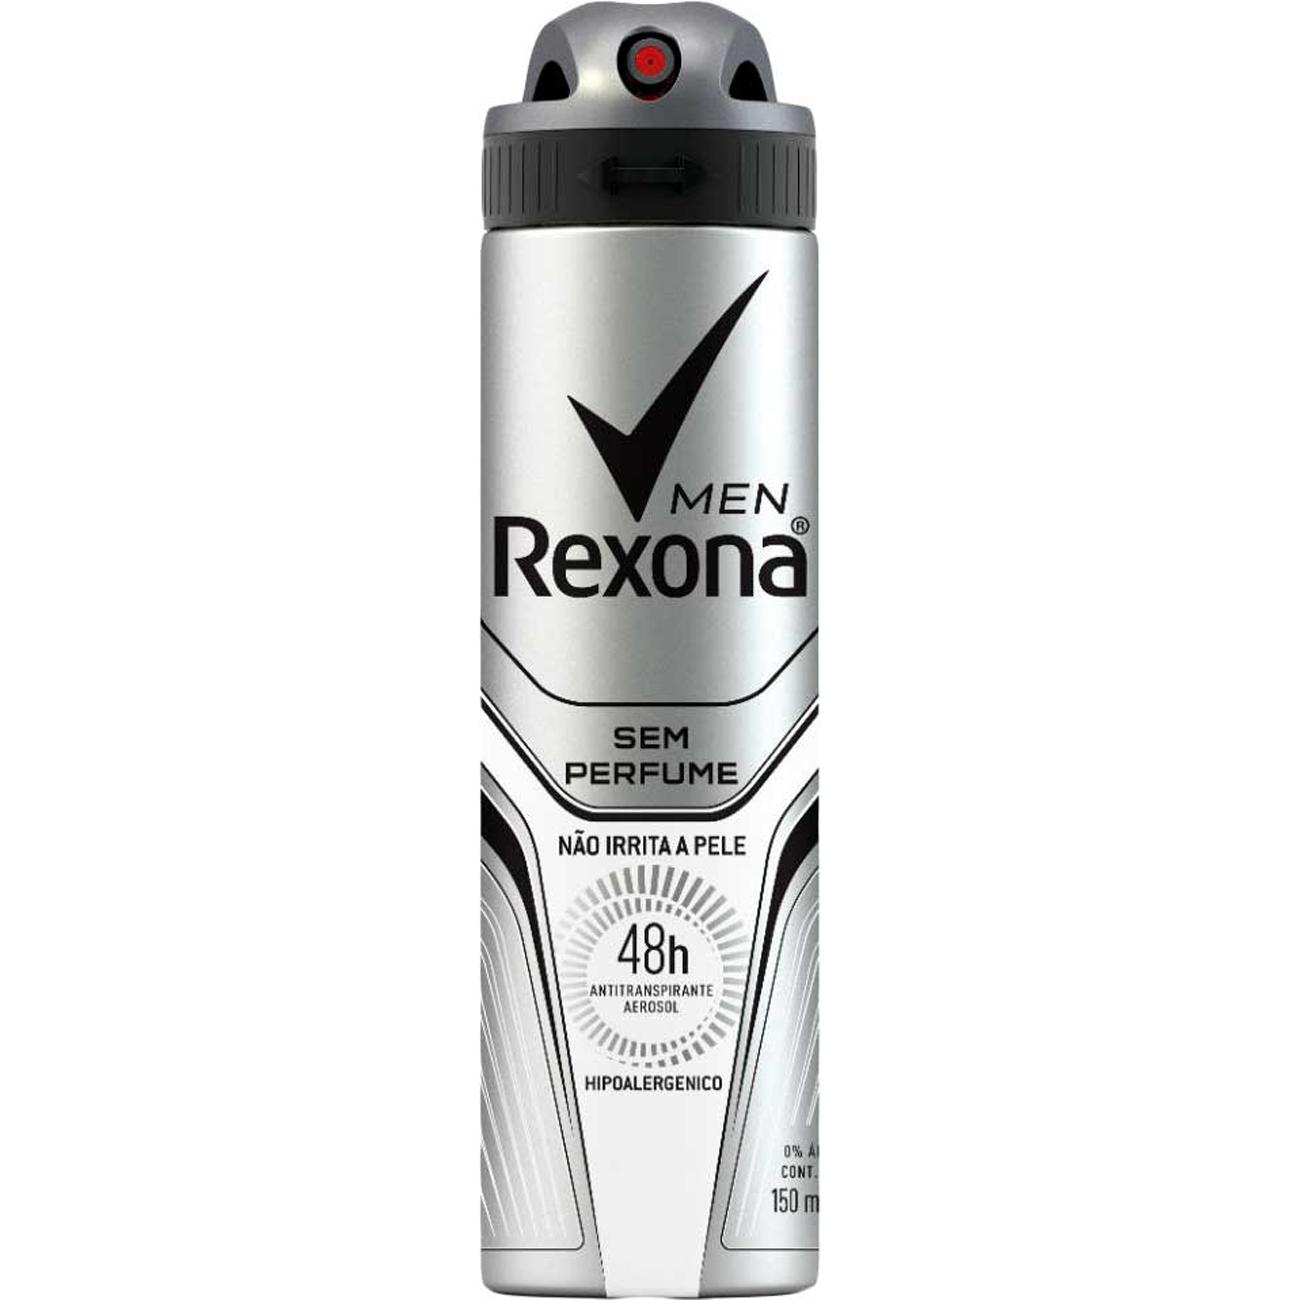 Desodorante Rexona Aero 90G M S/Perfume